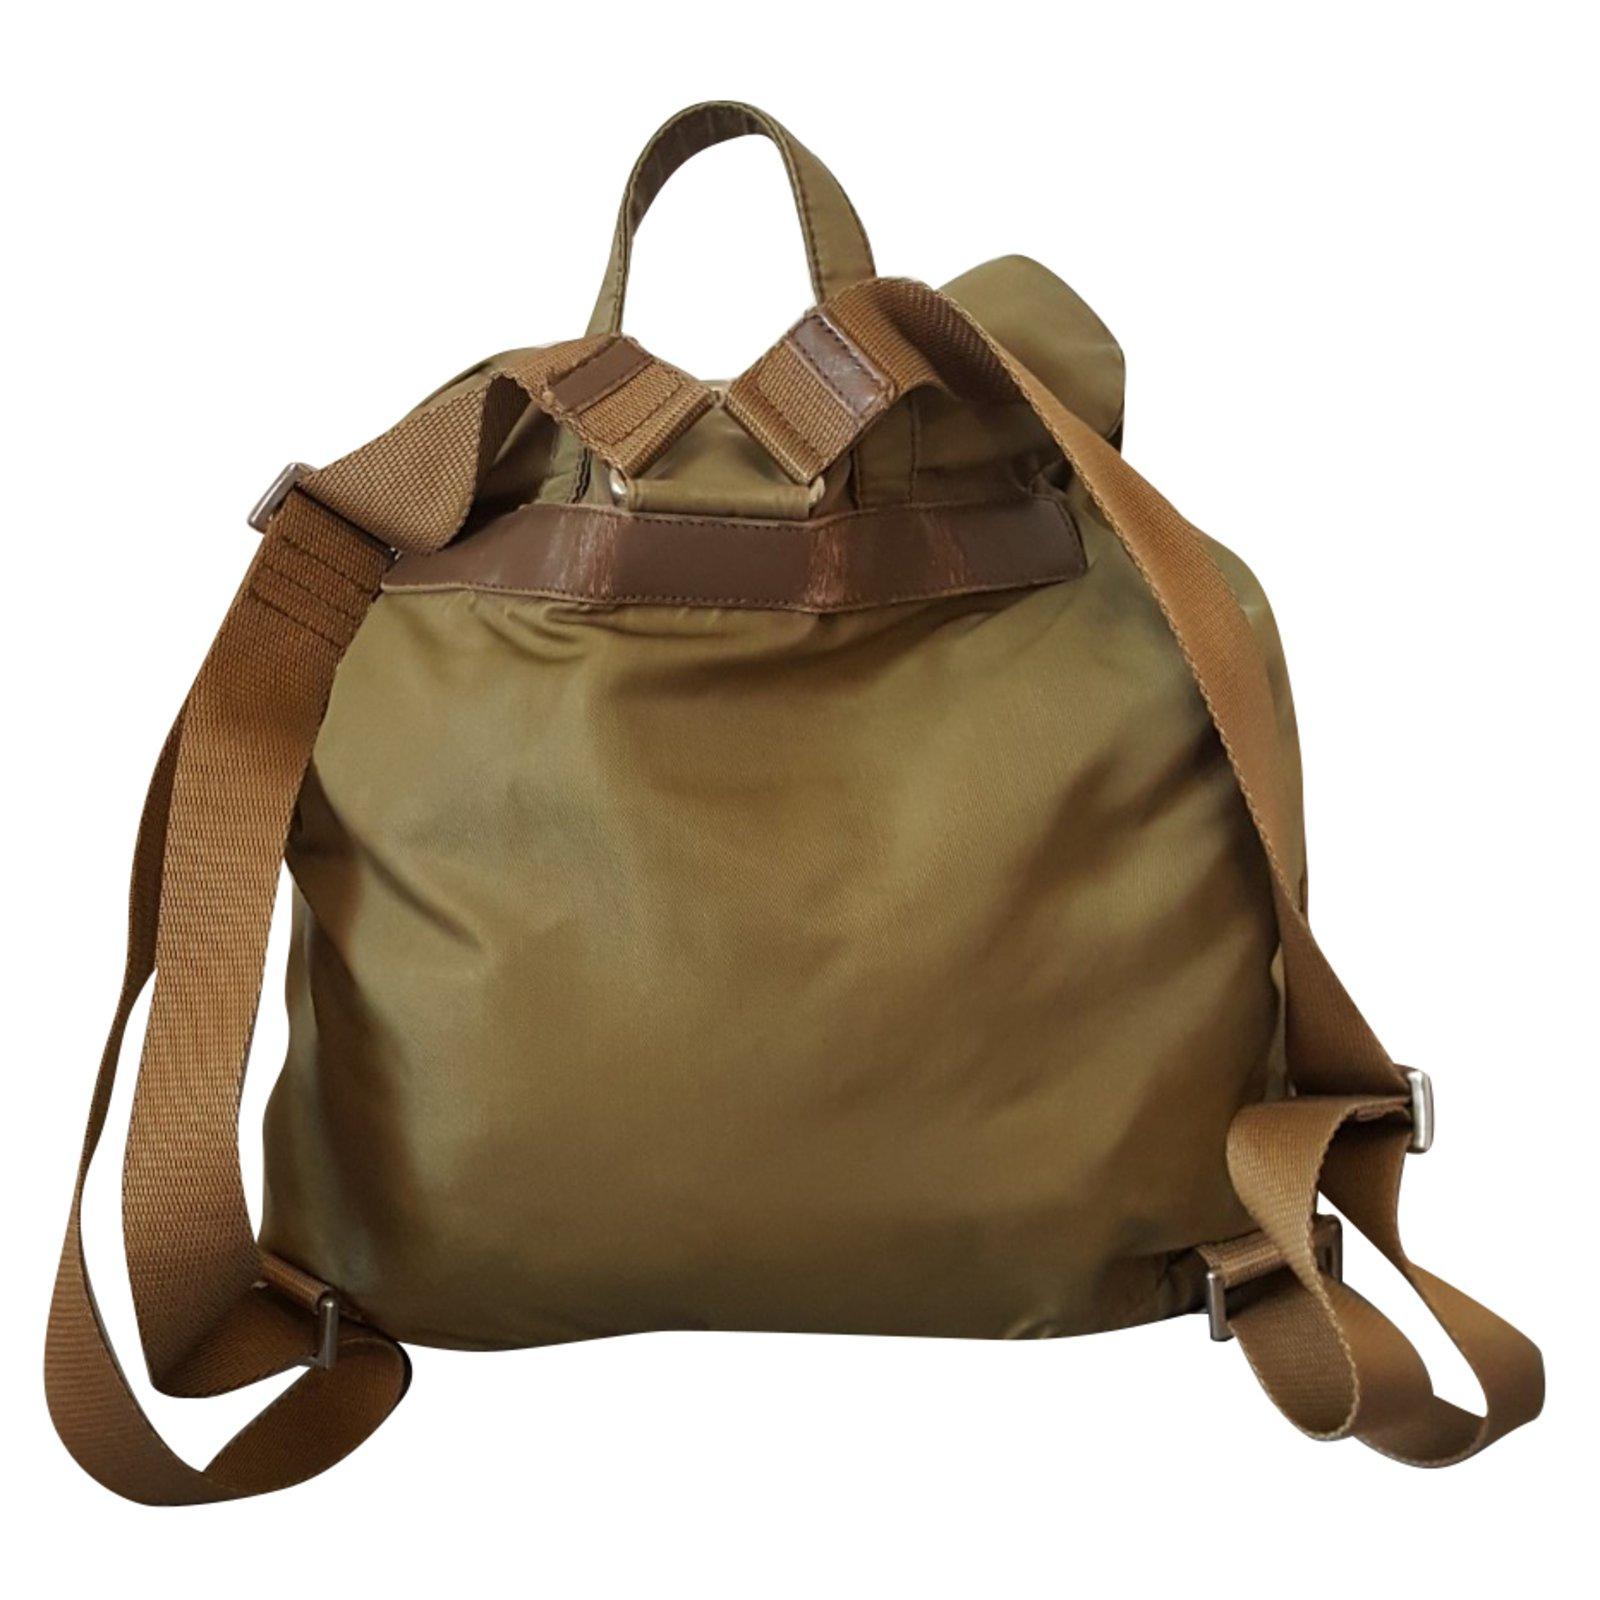 32cd9fc791e2 aliexpress prada bz0025 nylon backpack in green 9606c 024f1; reduced prada  backpacks backpacks synthetic green ref.79708 b29a9 5d457